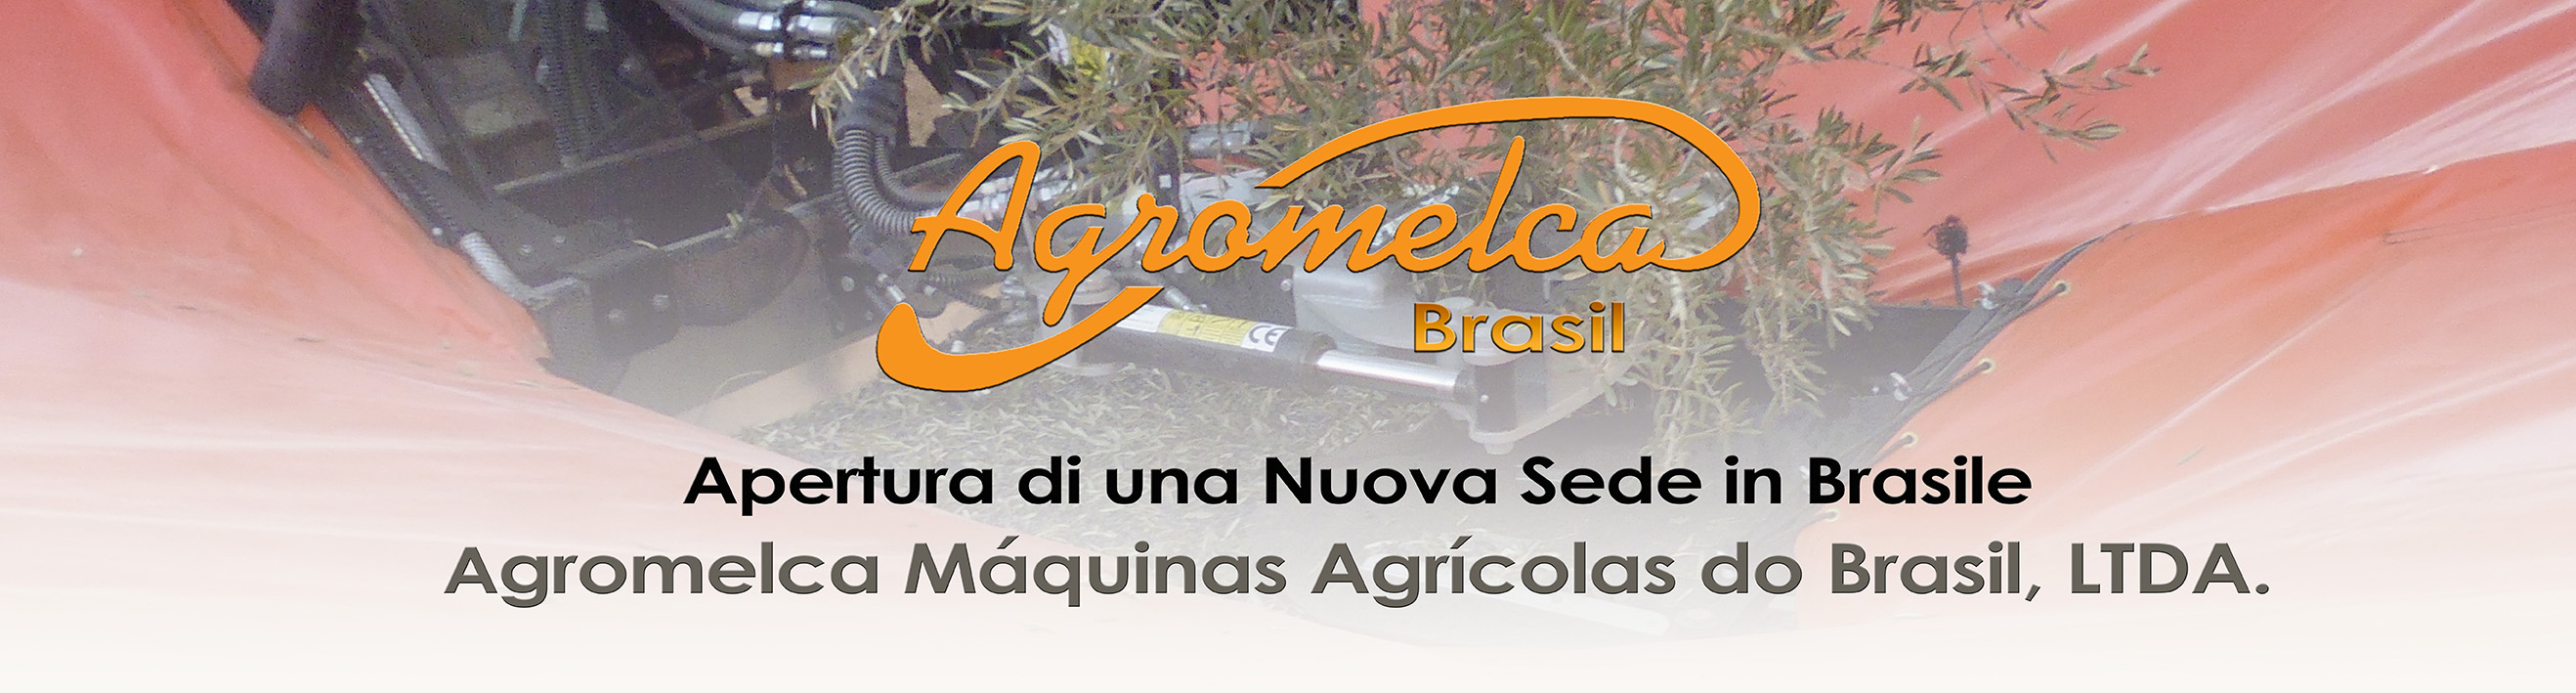 equipos_recolectores_de_aceituna_y_frutos_secos_agromelca_en_brasil_italiano-banner